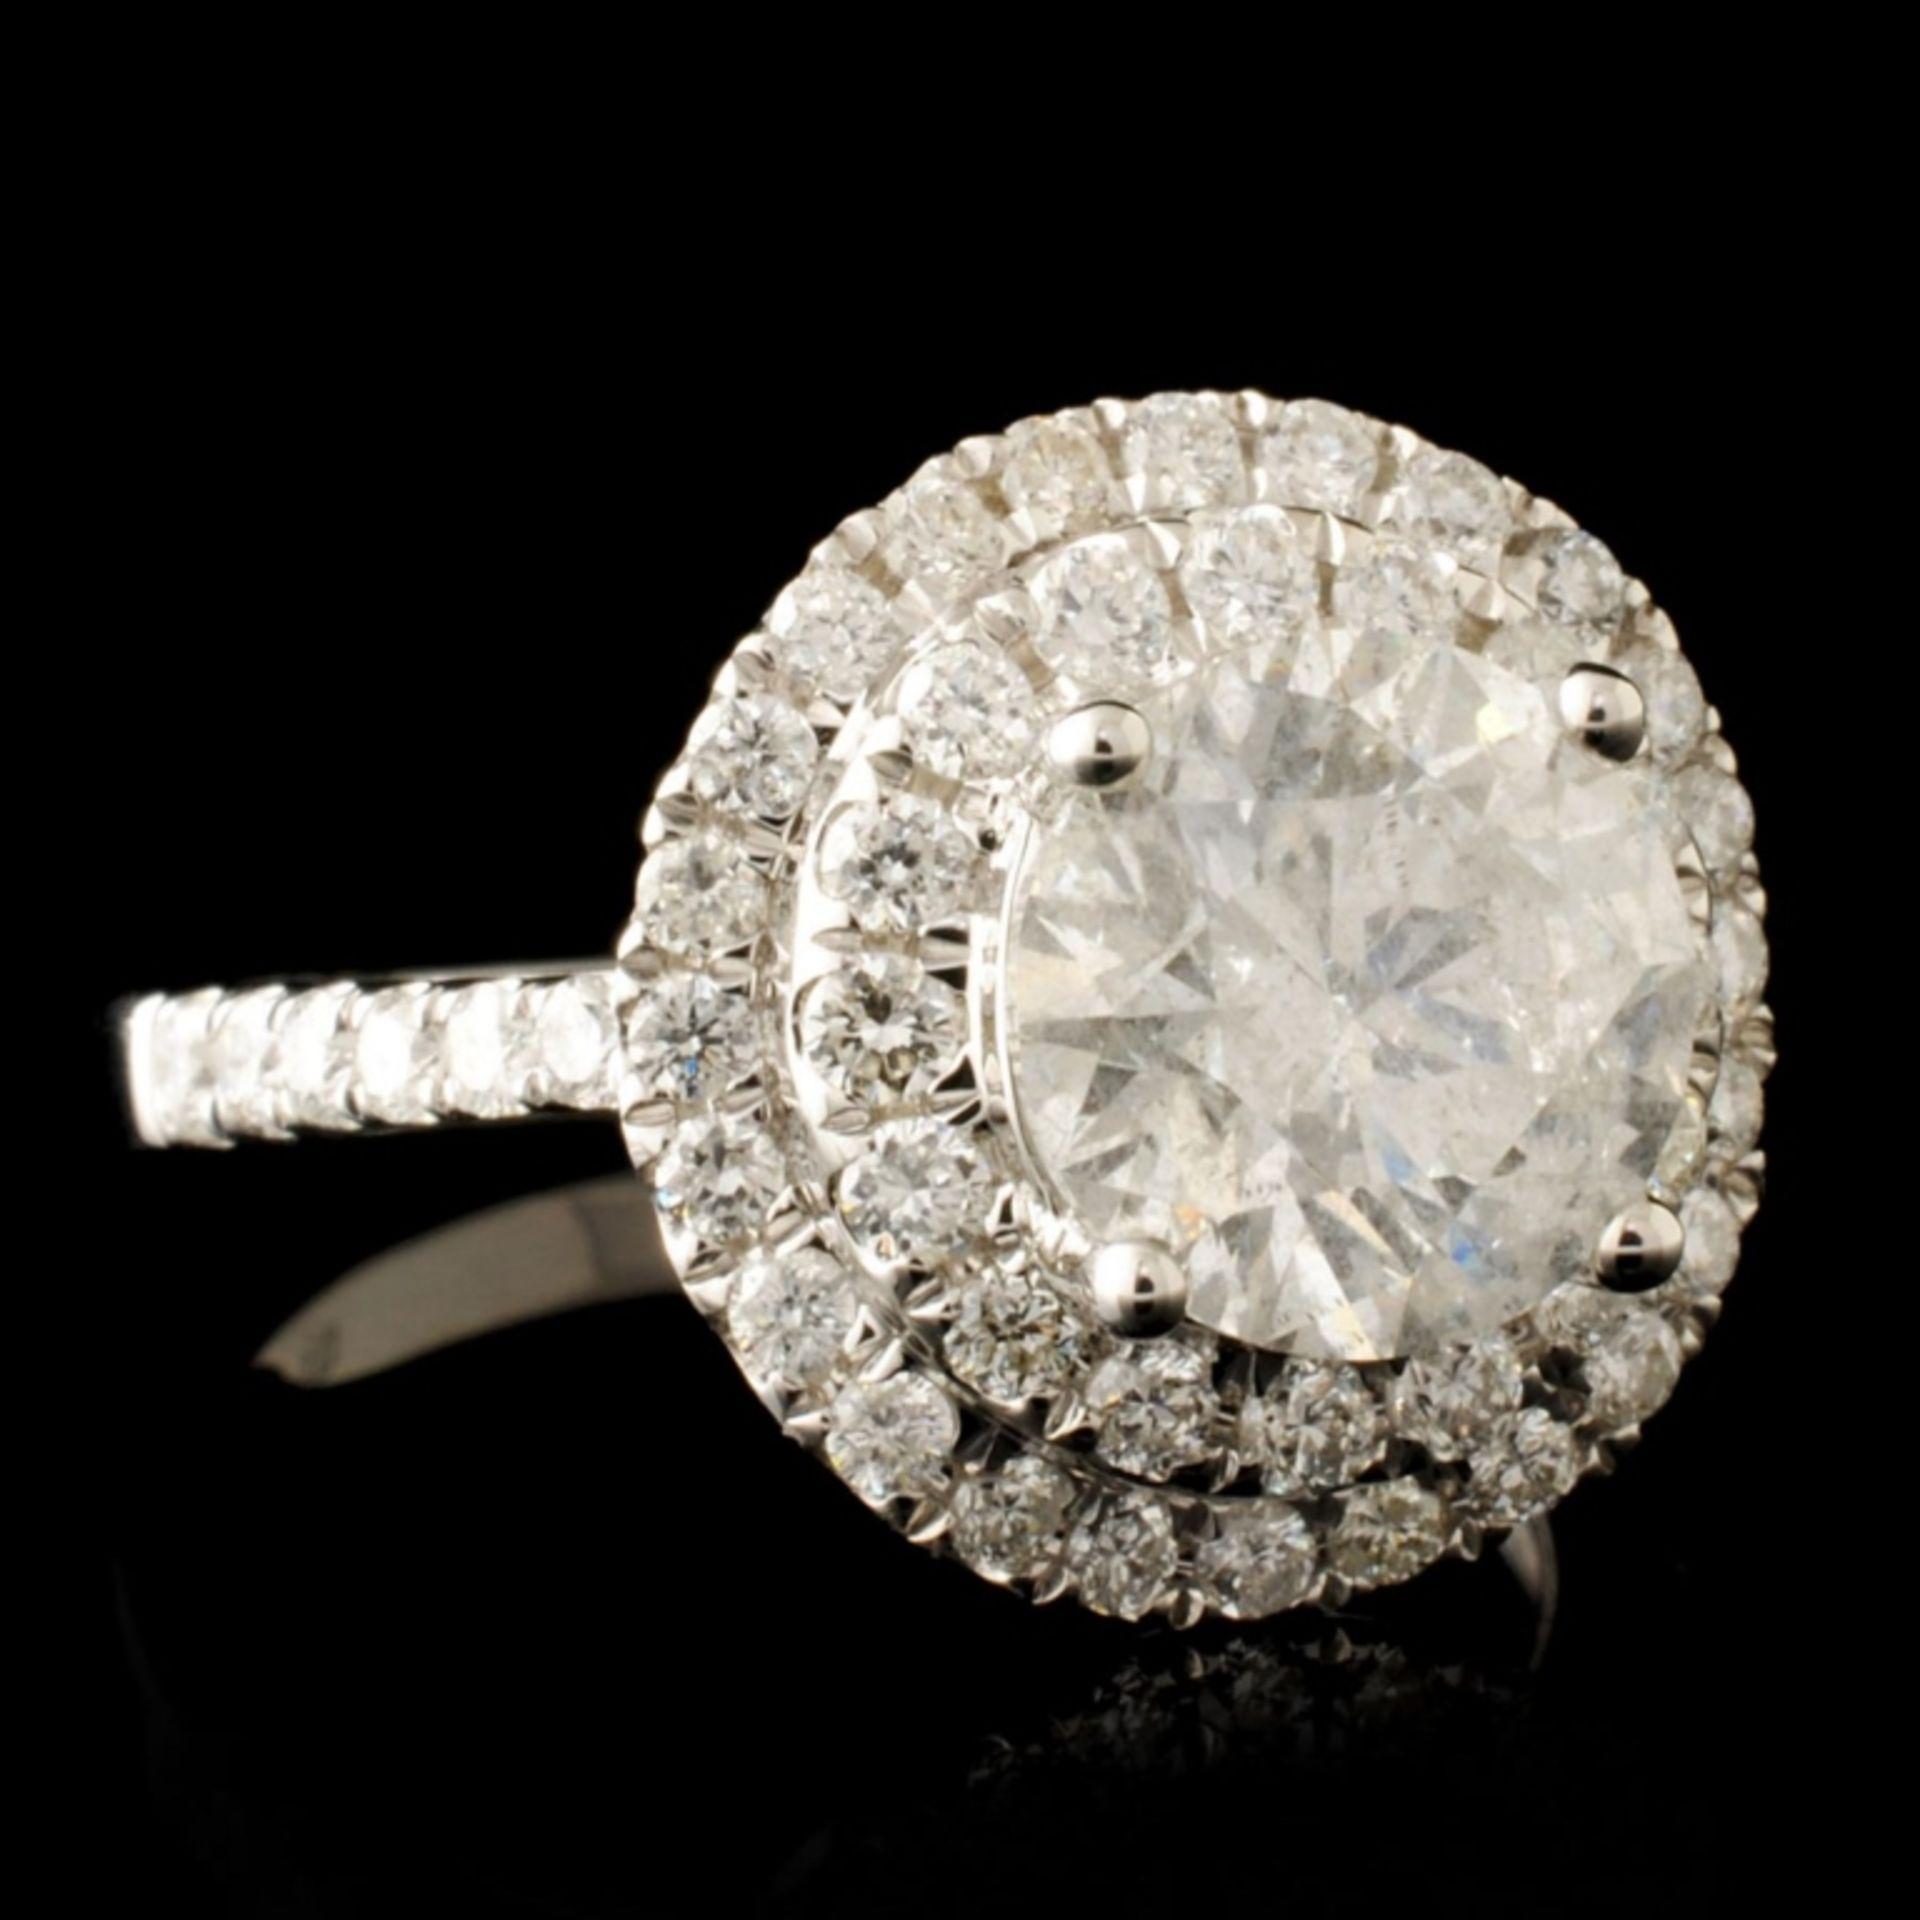 18K Gold 2.73ctw Diamond Ring - Image 3 of 7